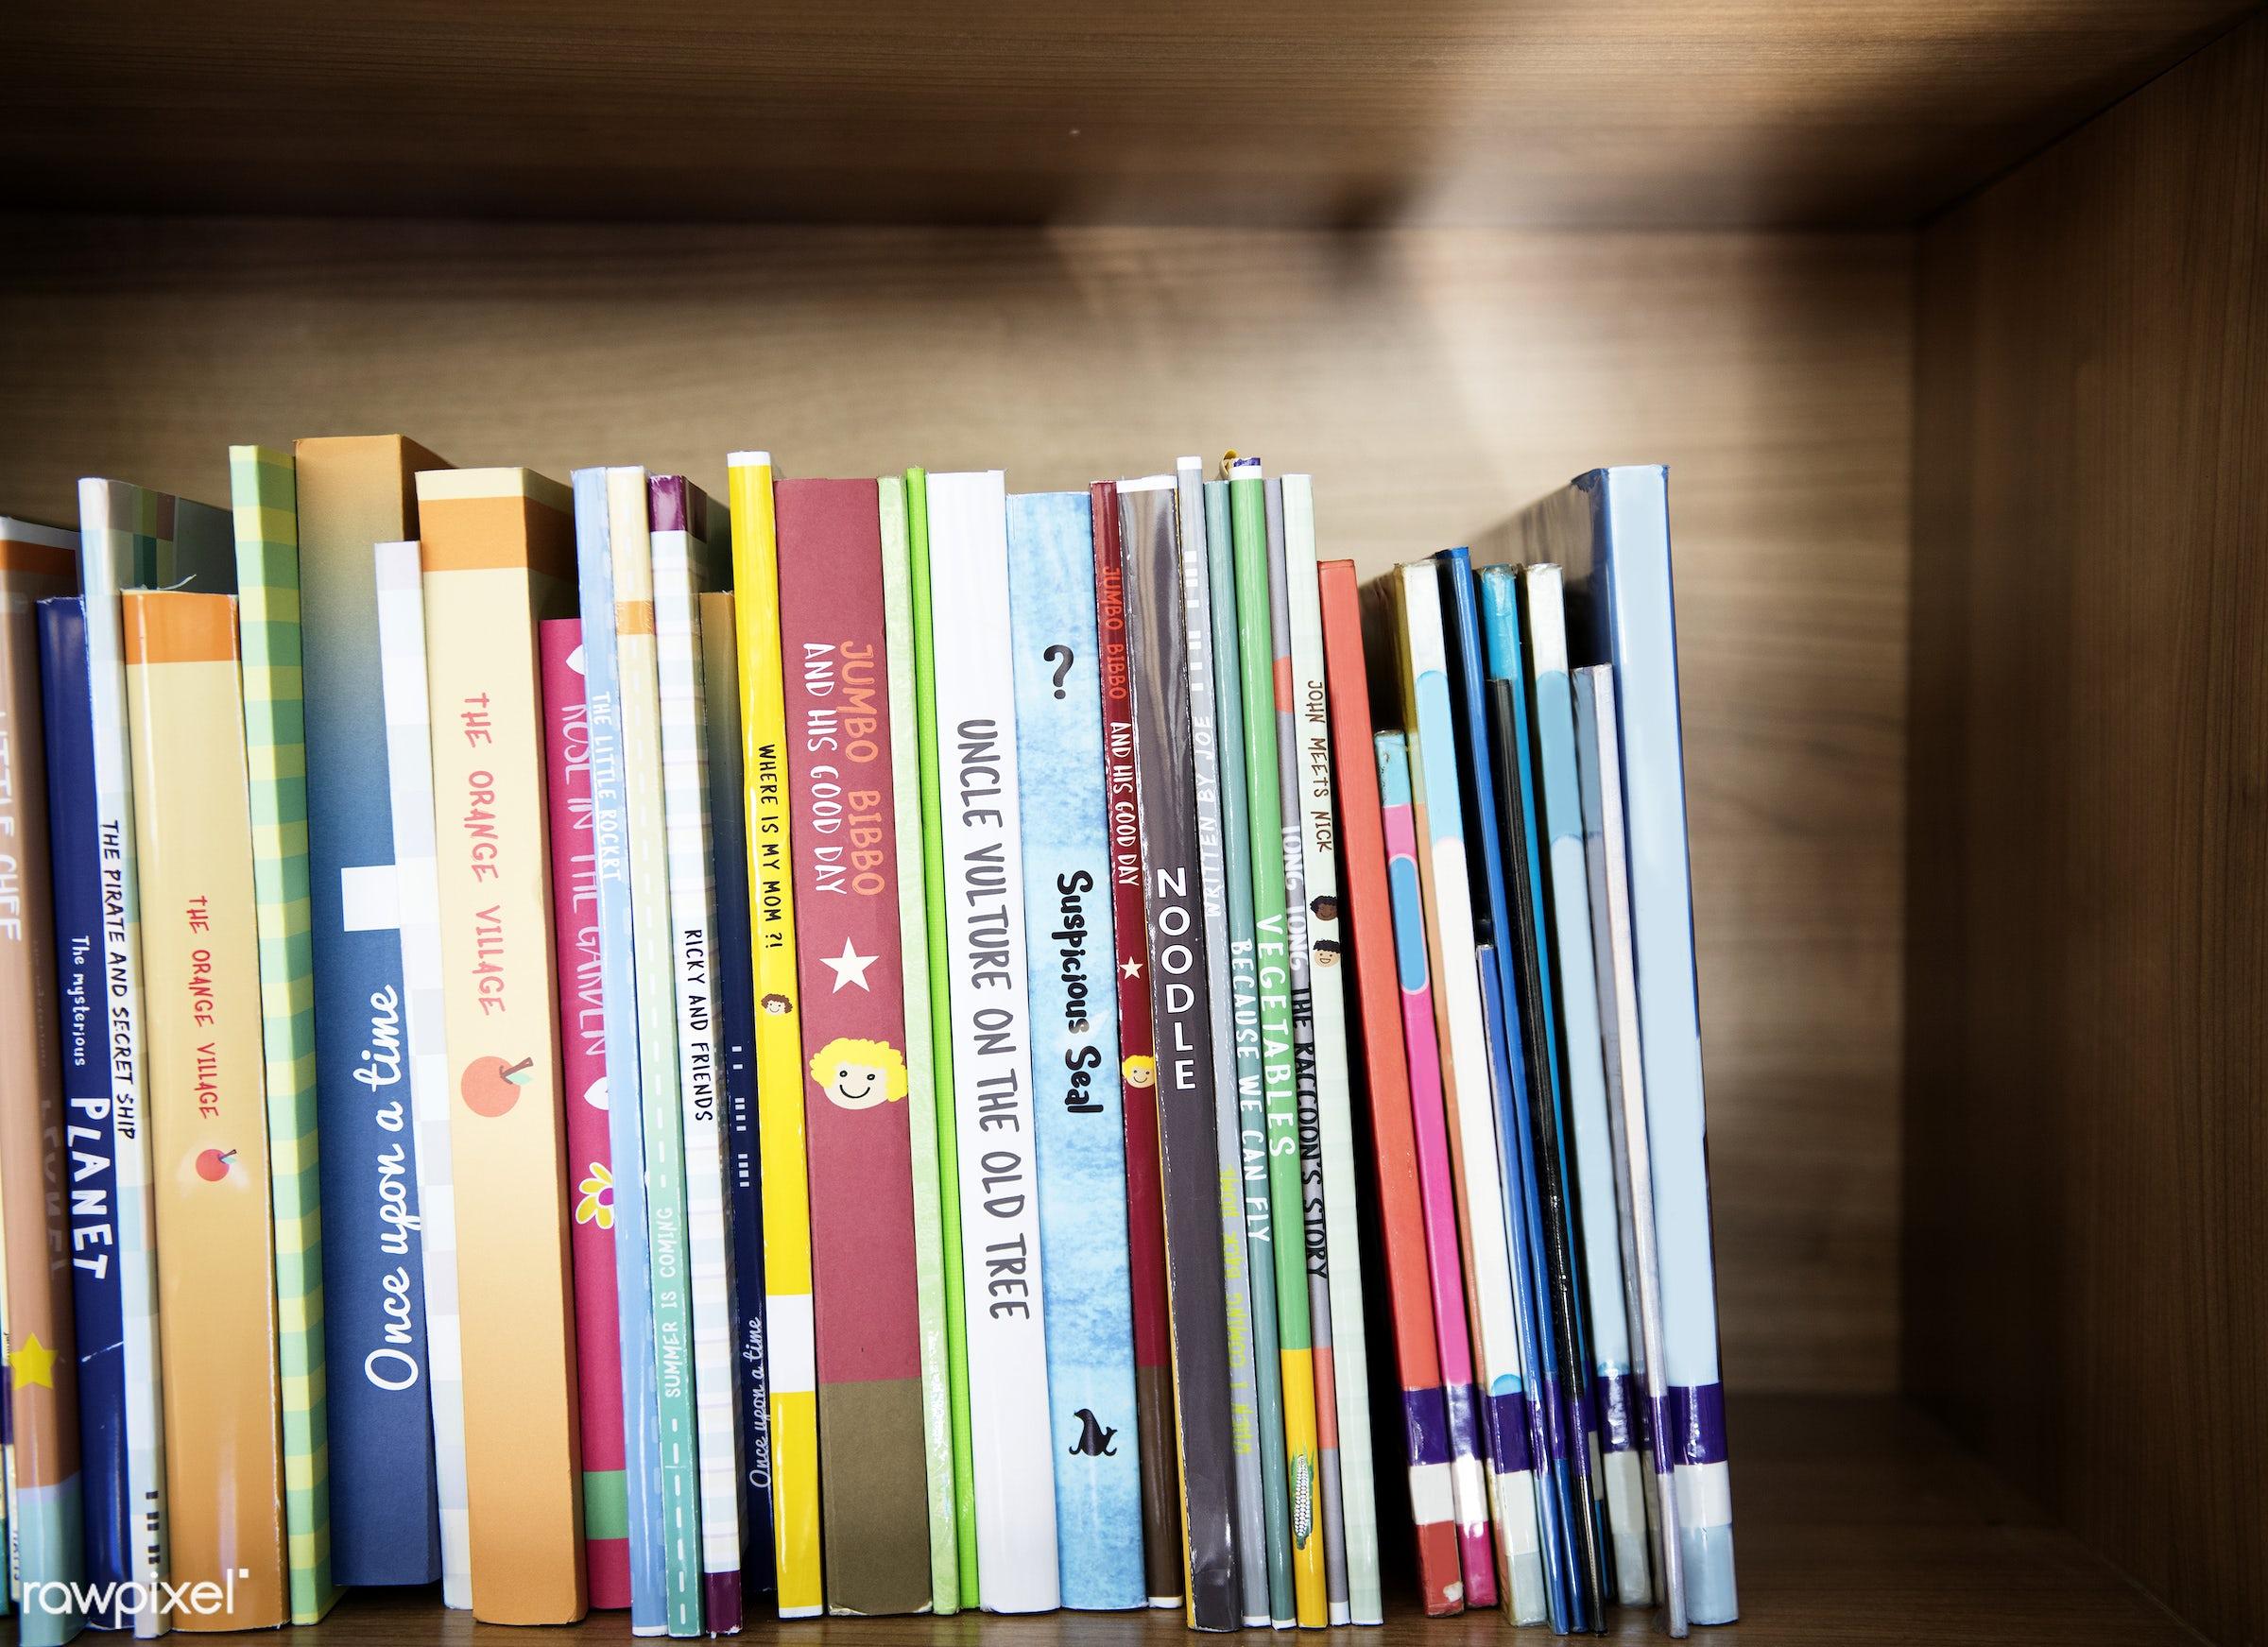 Children's books at elementary school library - education, stack, story, books, bookshelf, children, covers, drawing,...